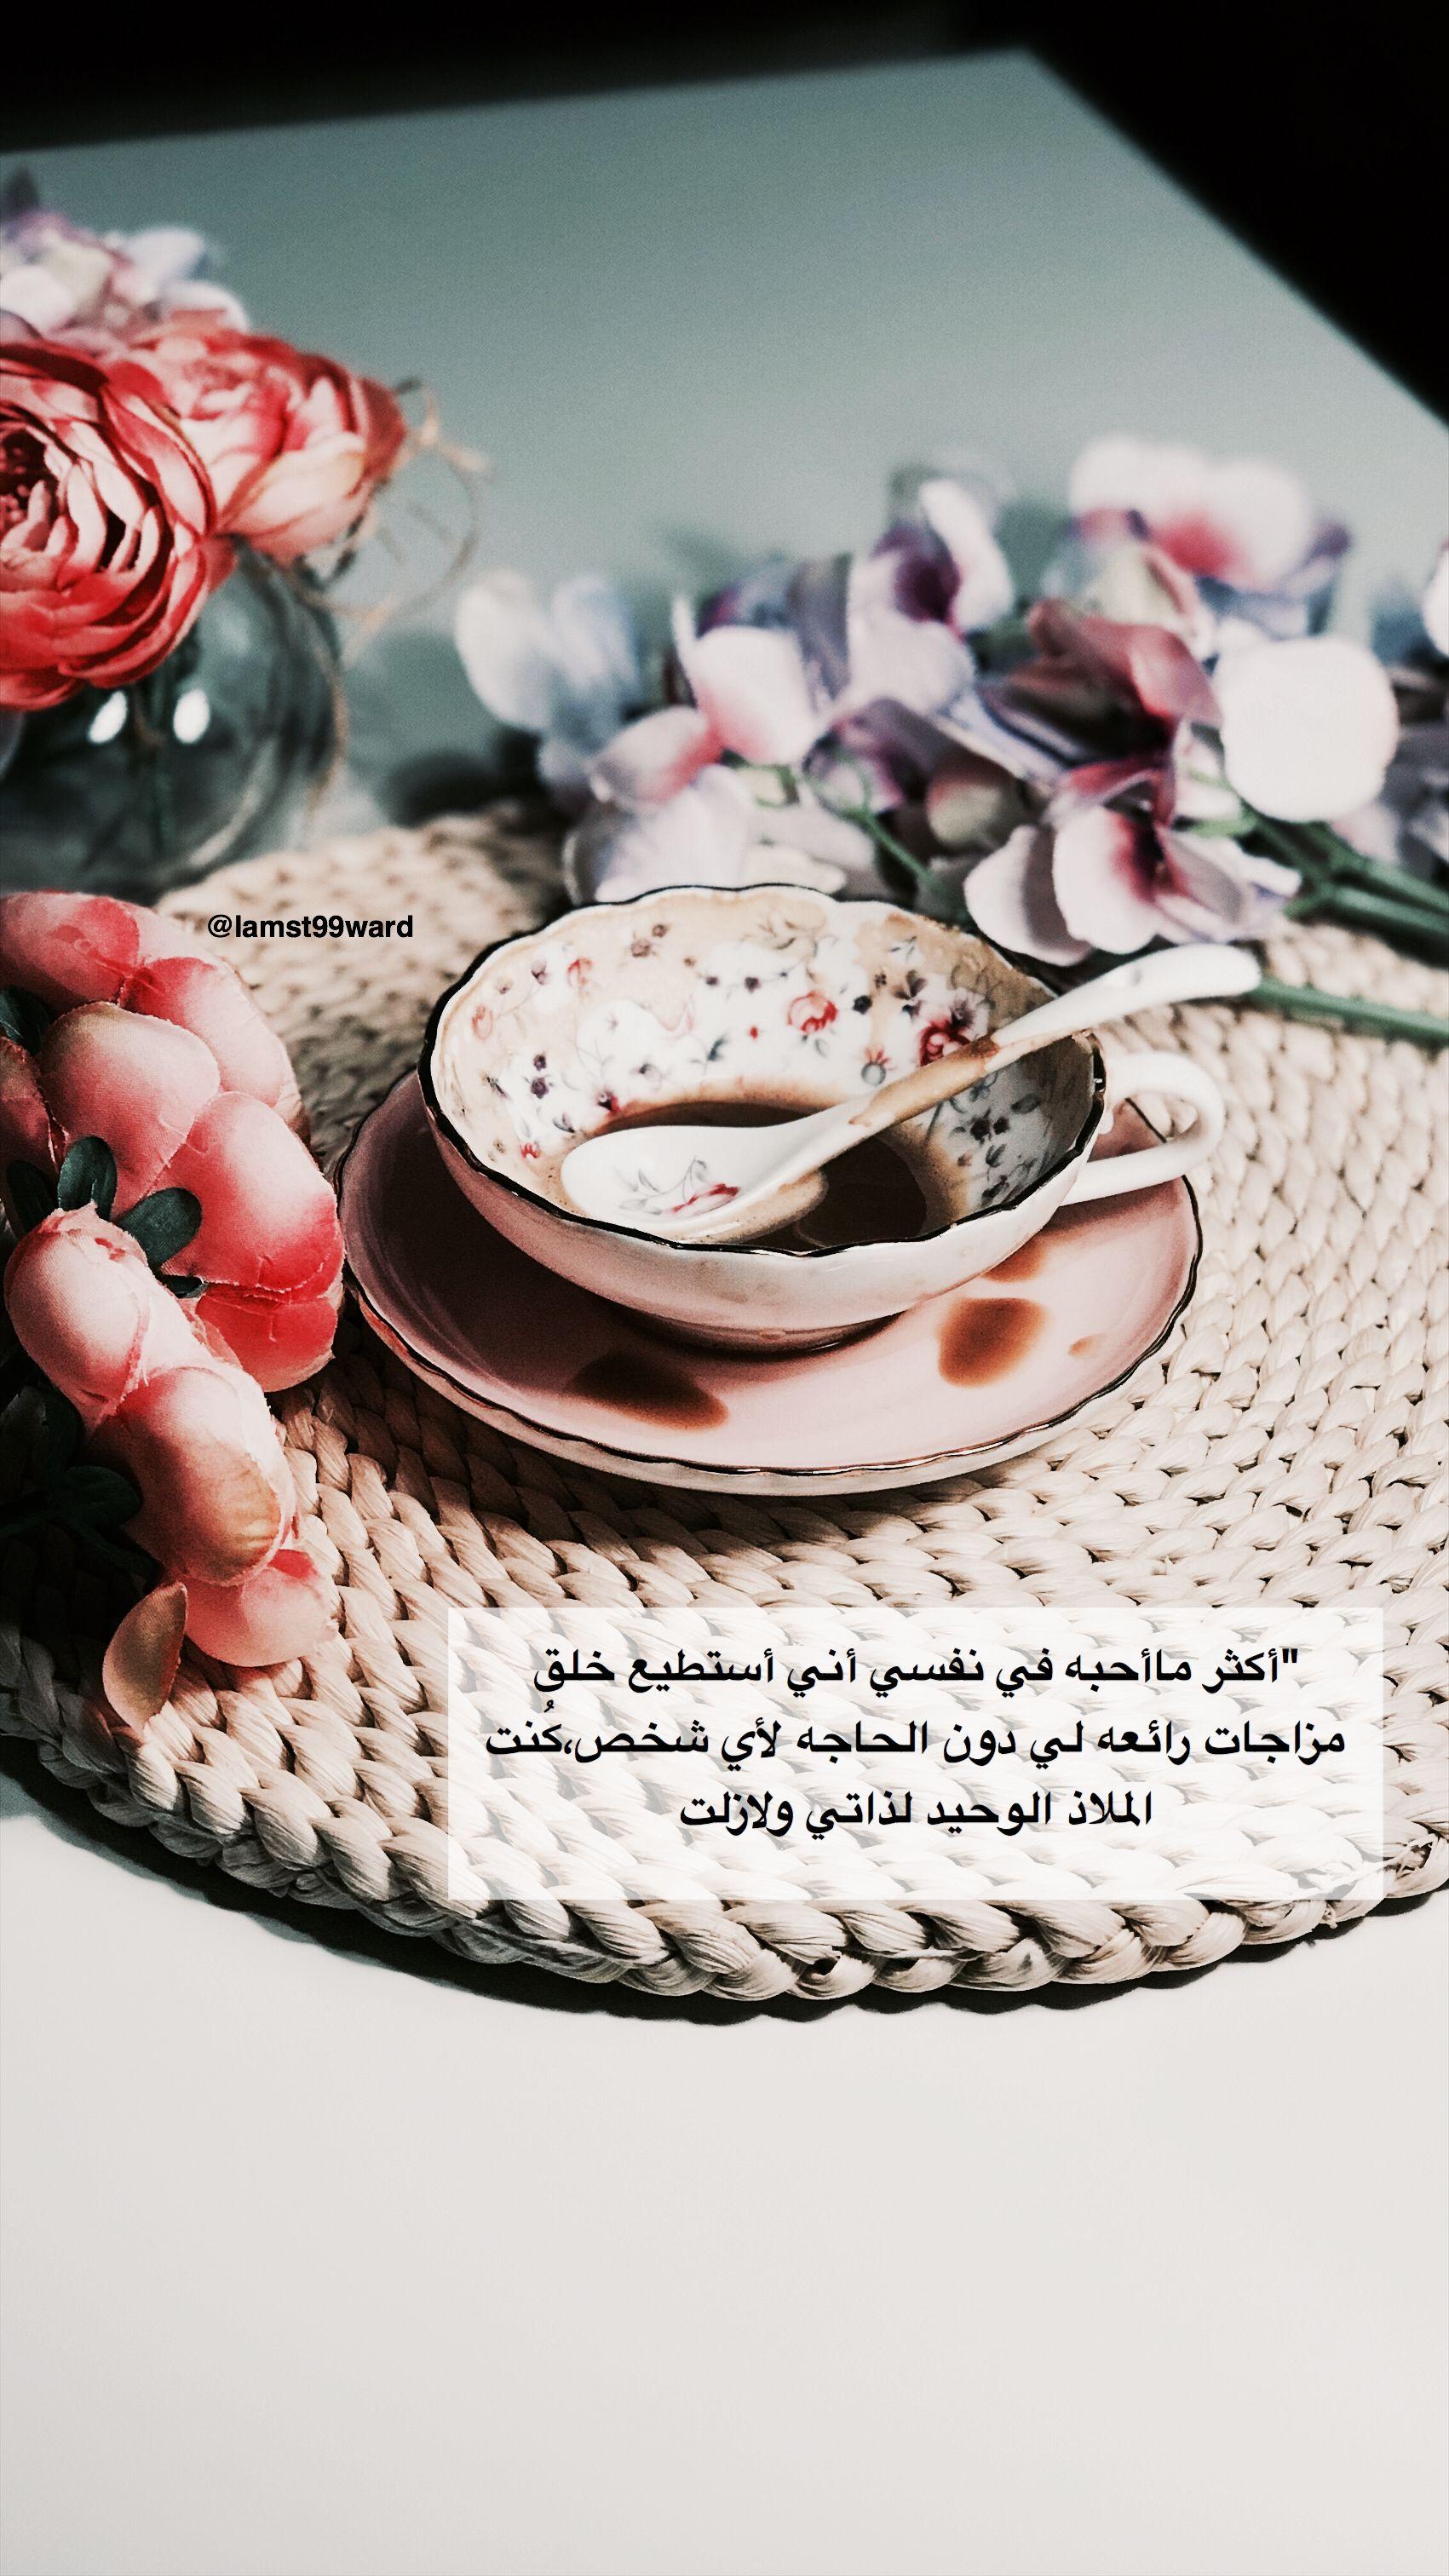 دعاء صورة افكار_تصوير احترافيه coffee coffeetime